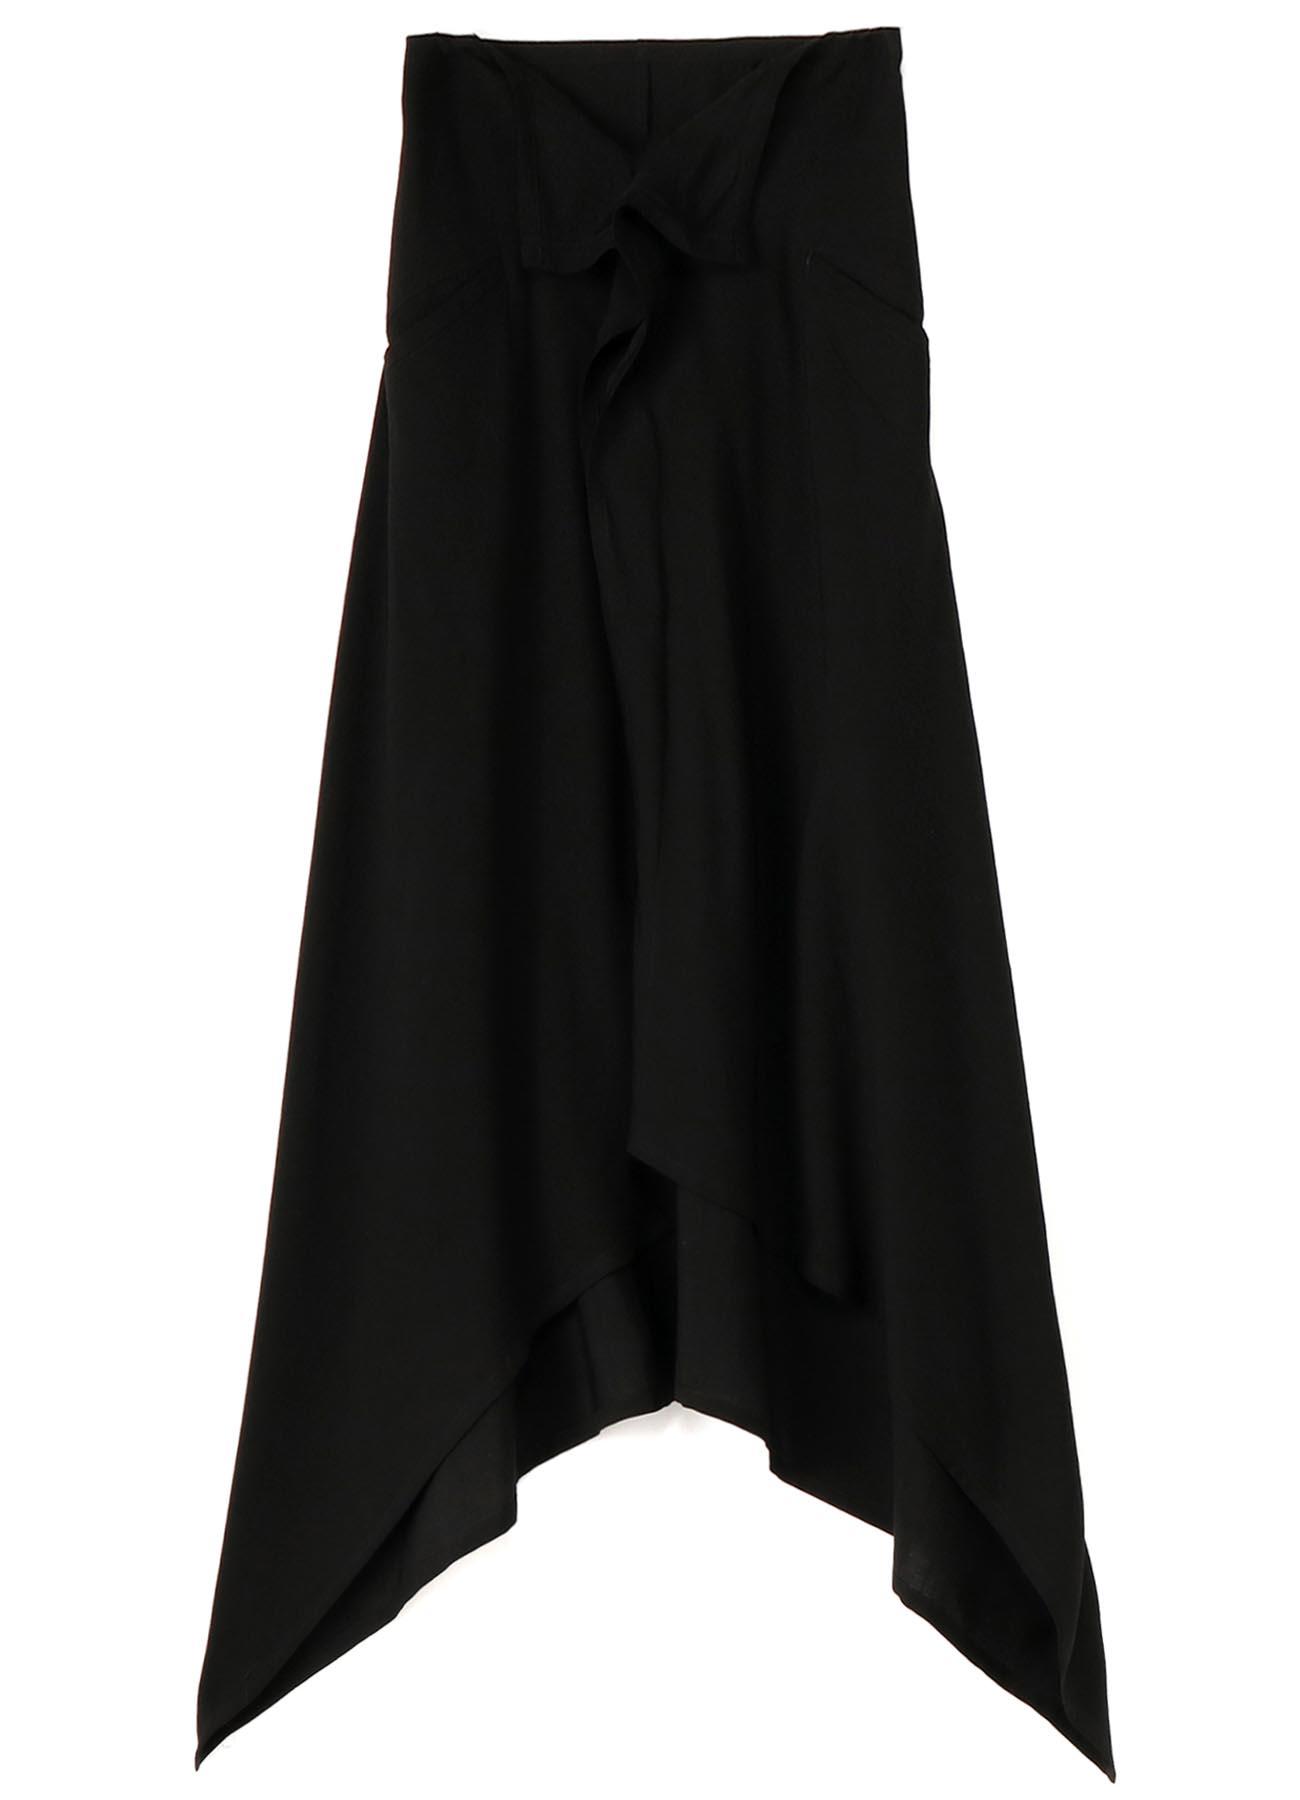 Ten/Cu Tussah Square Skirt